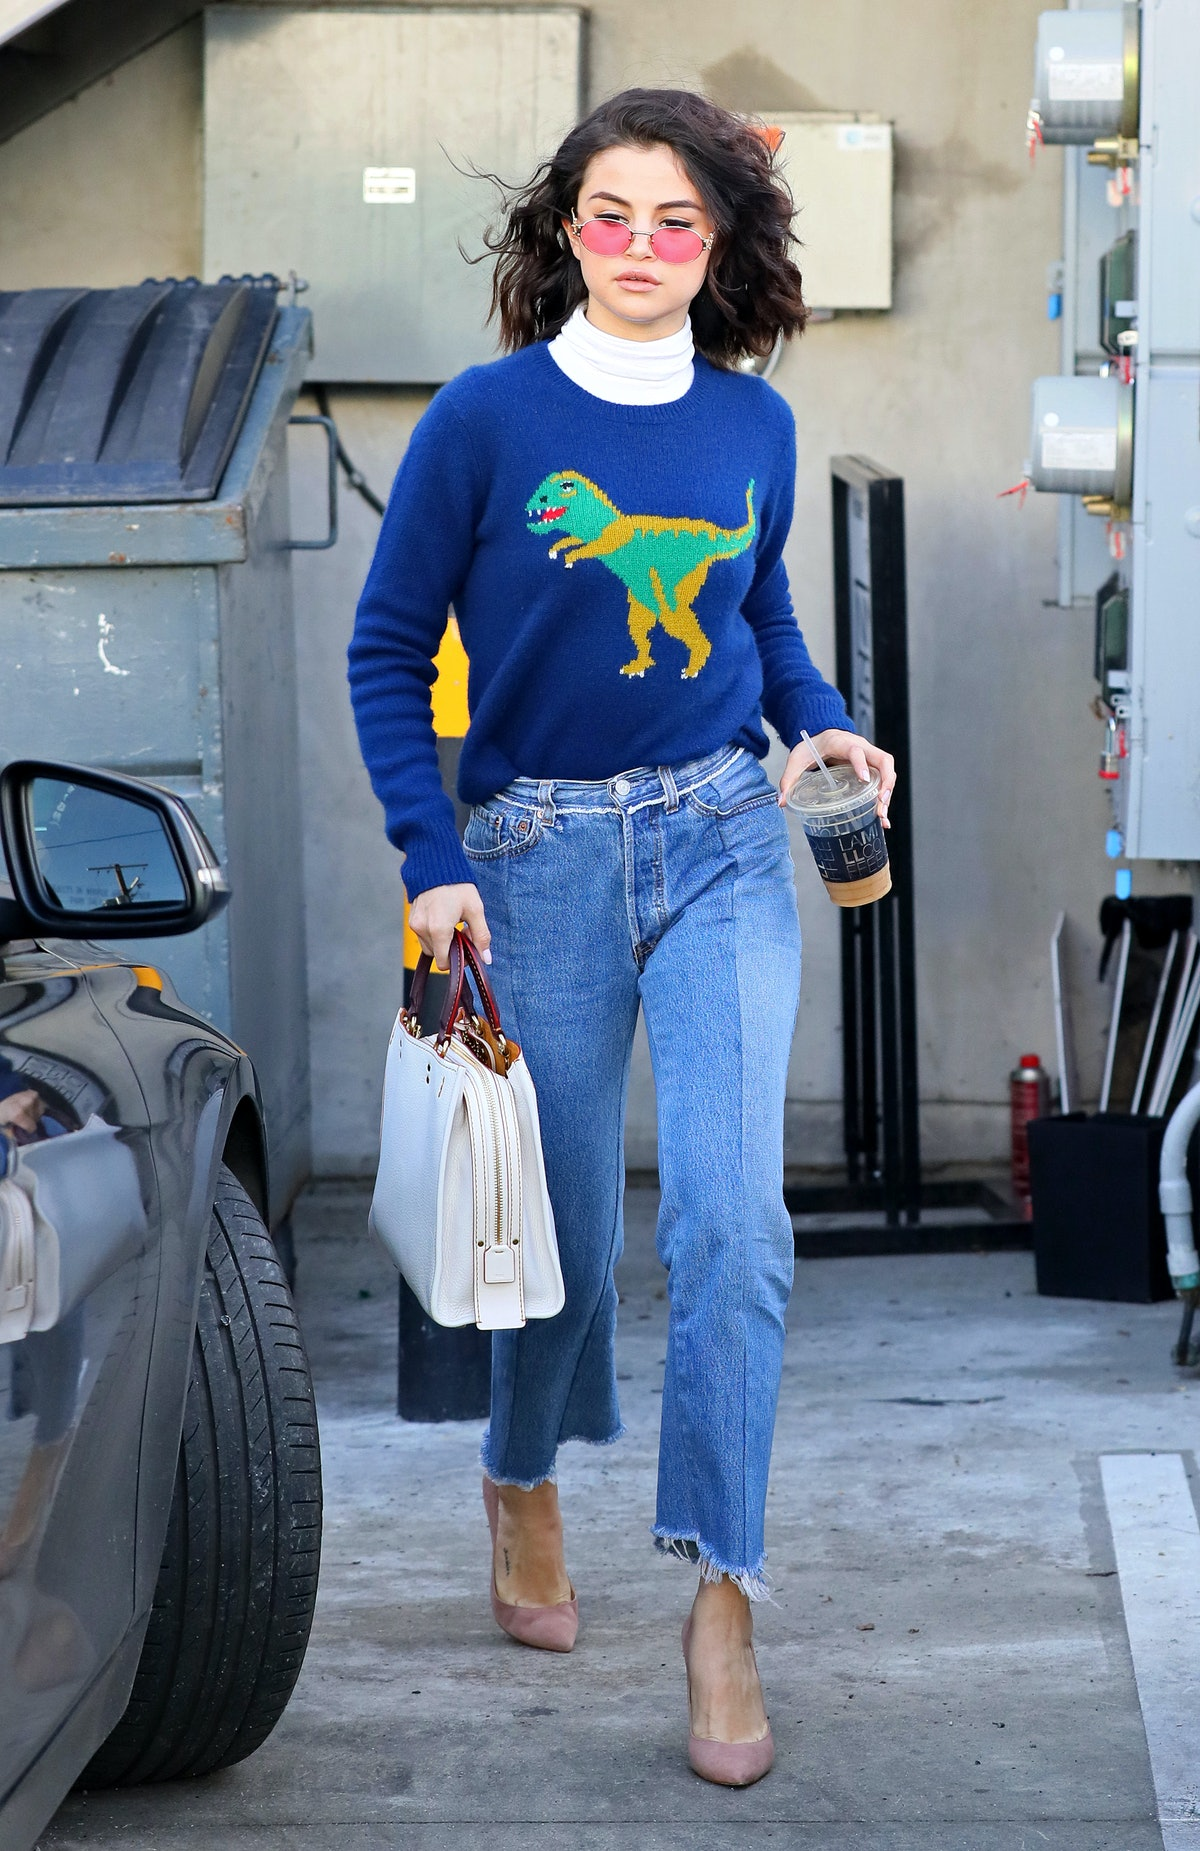 LOS ANGELES, CA - JANUARY 19: Selena Gomez is seen on January 19, 2017 in Los Angeles, California.(P...